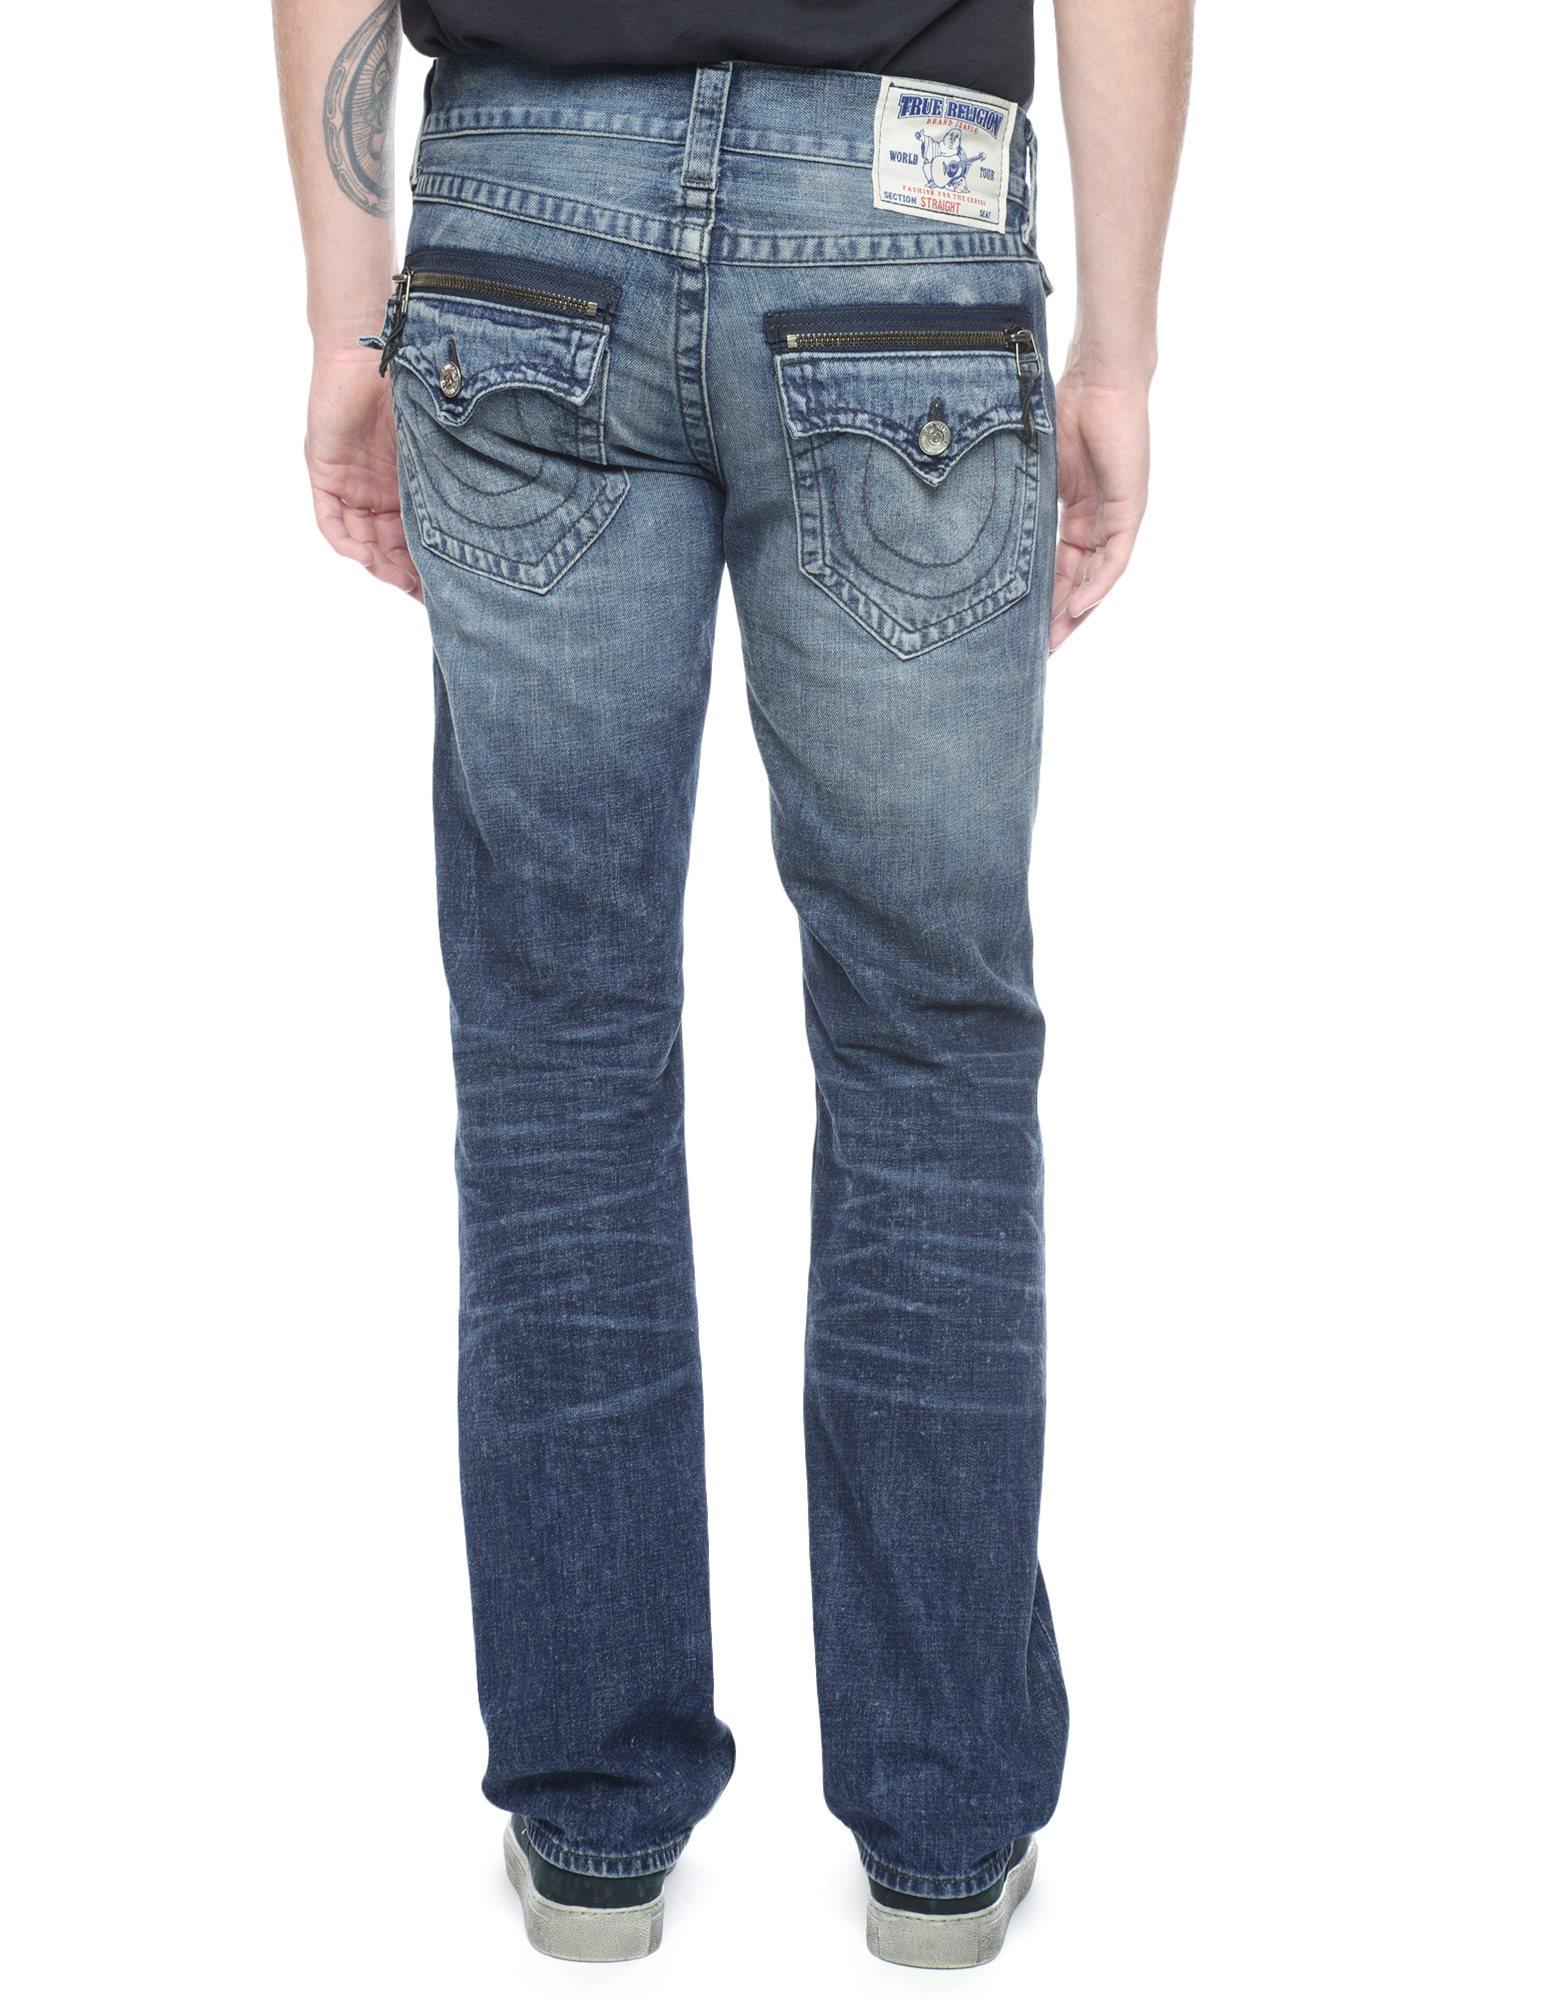 Mens Distressed Jean Shorts